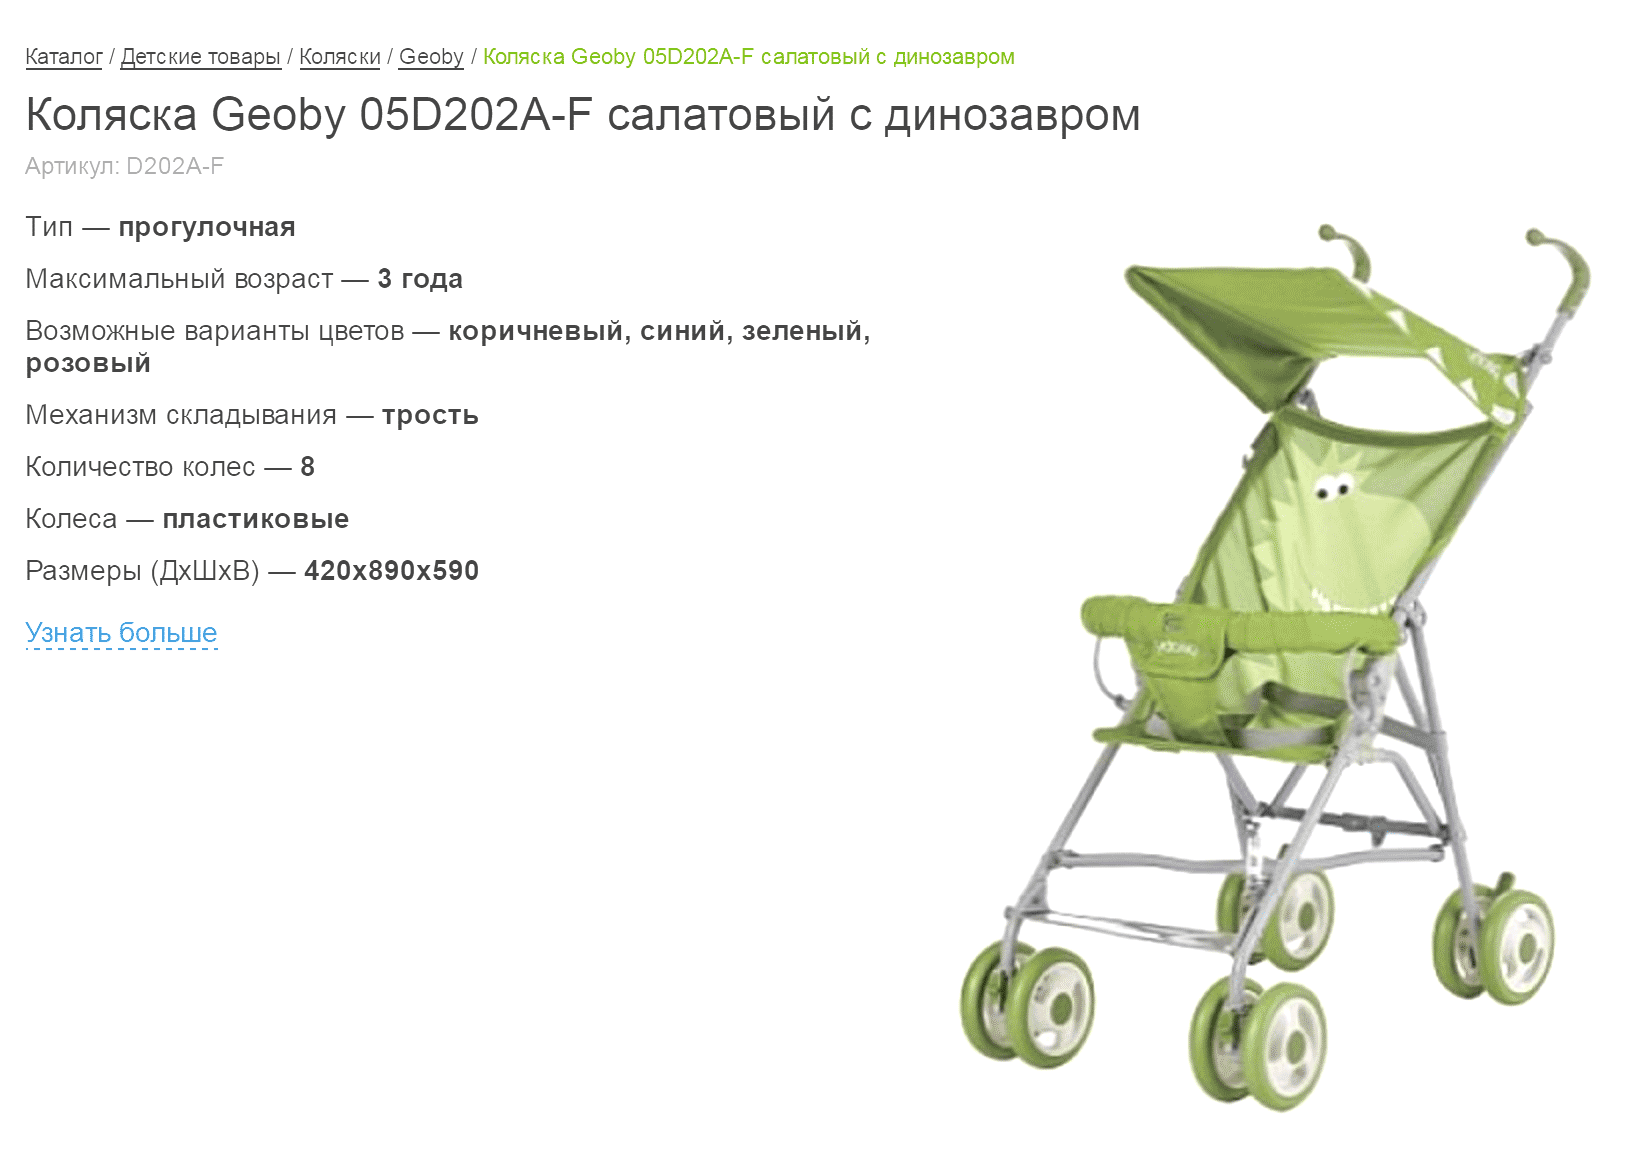 Эта коляска весит 4,3 кг. Ее разрешат взять в салон самолета